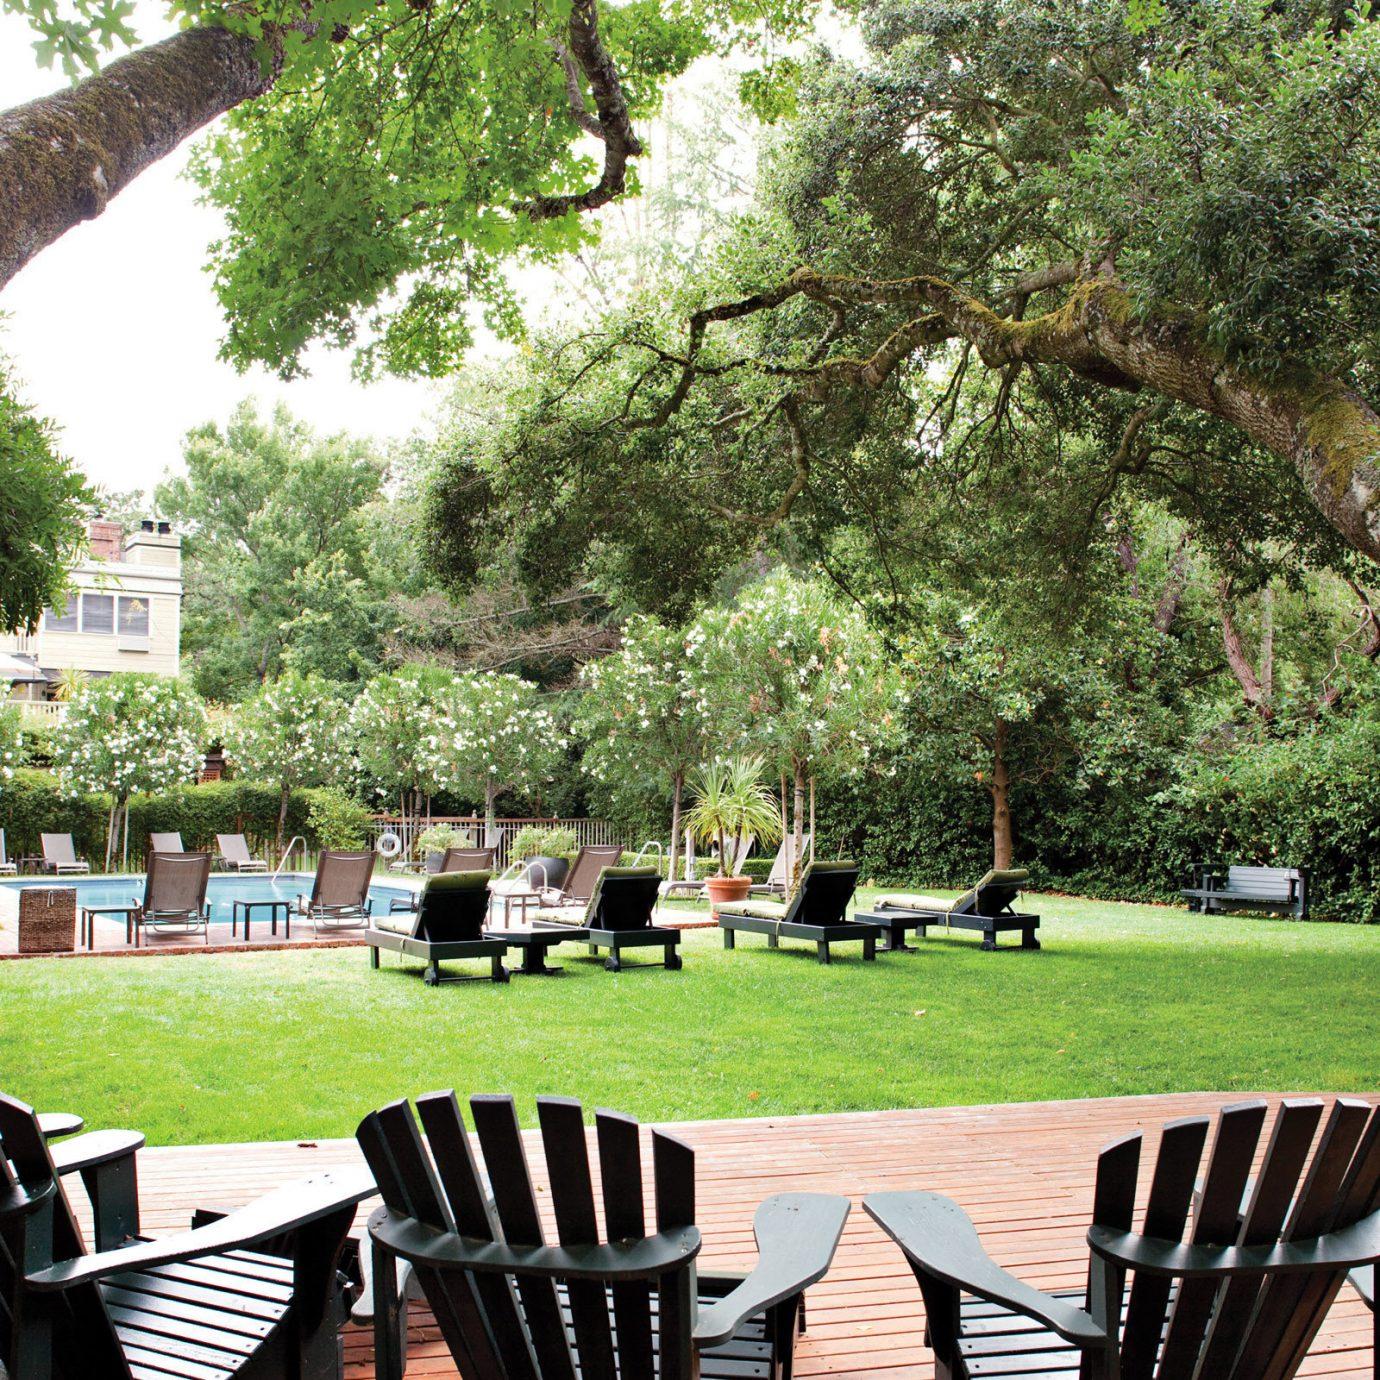 Boutique Grounds Inn Romance tree grass chair park Picnic wooden Garden backyard flower lawn plant day shade